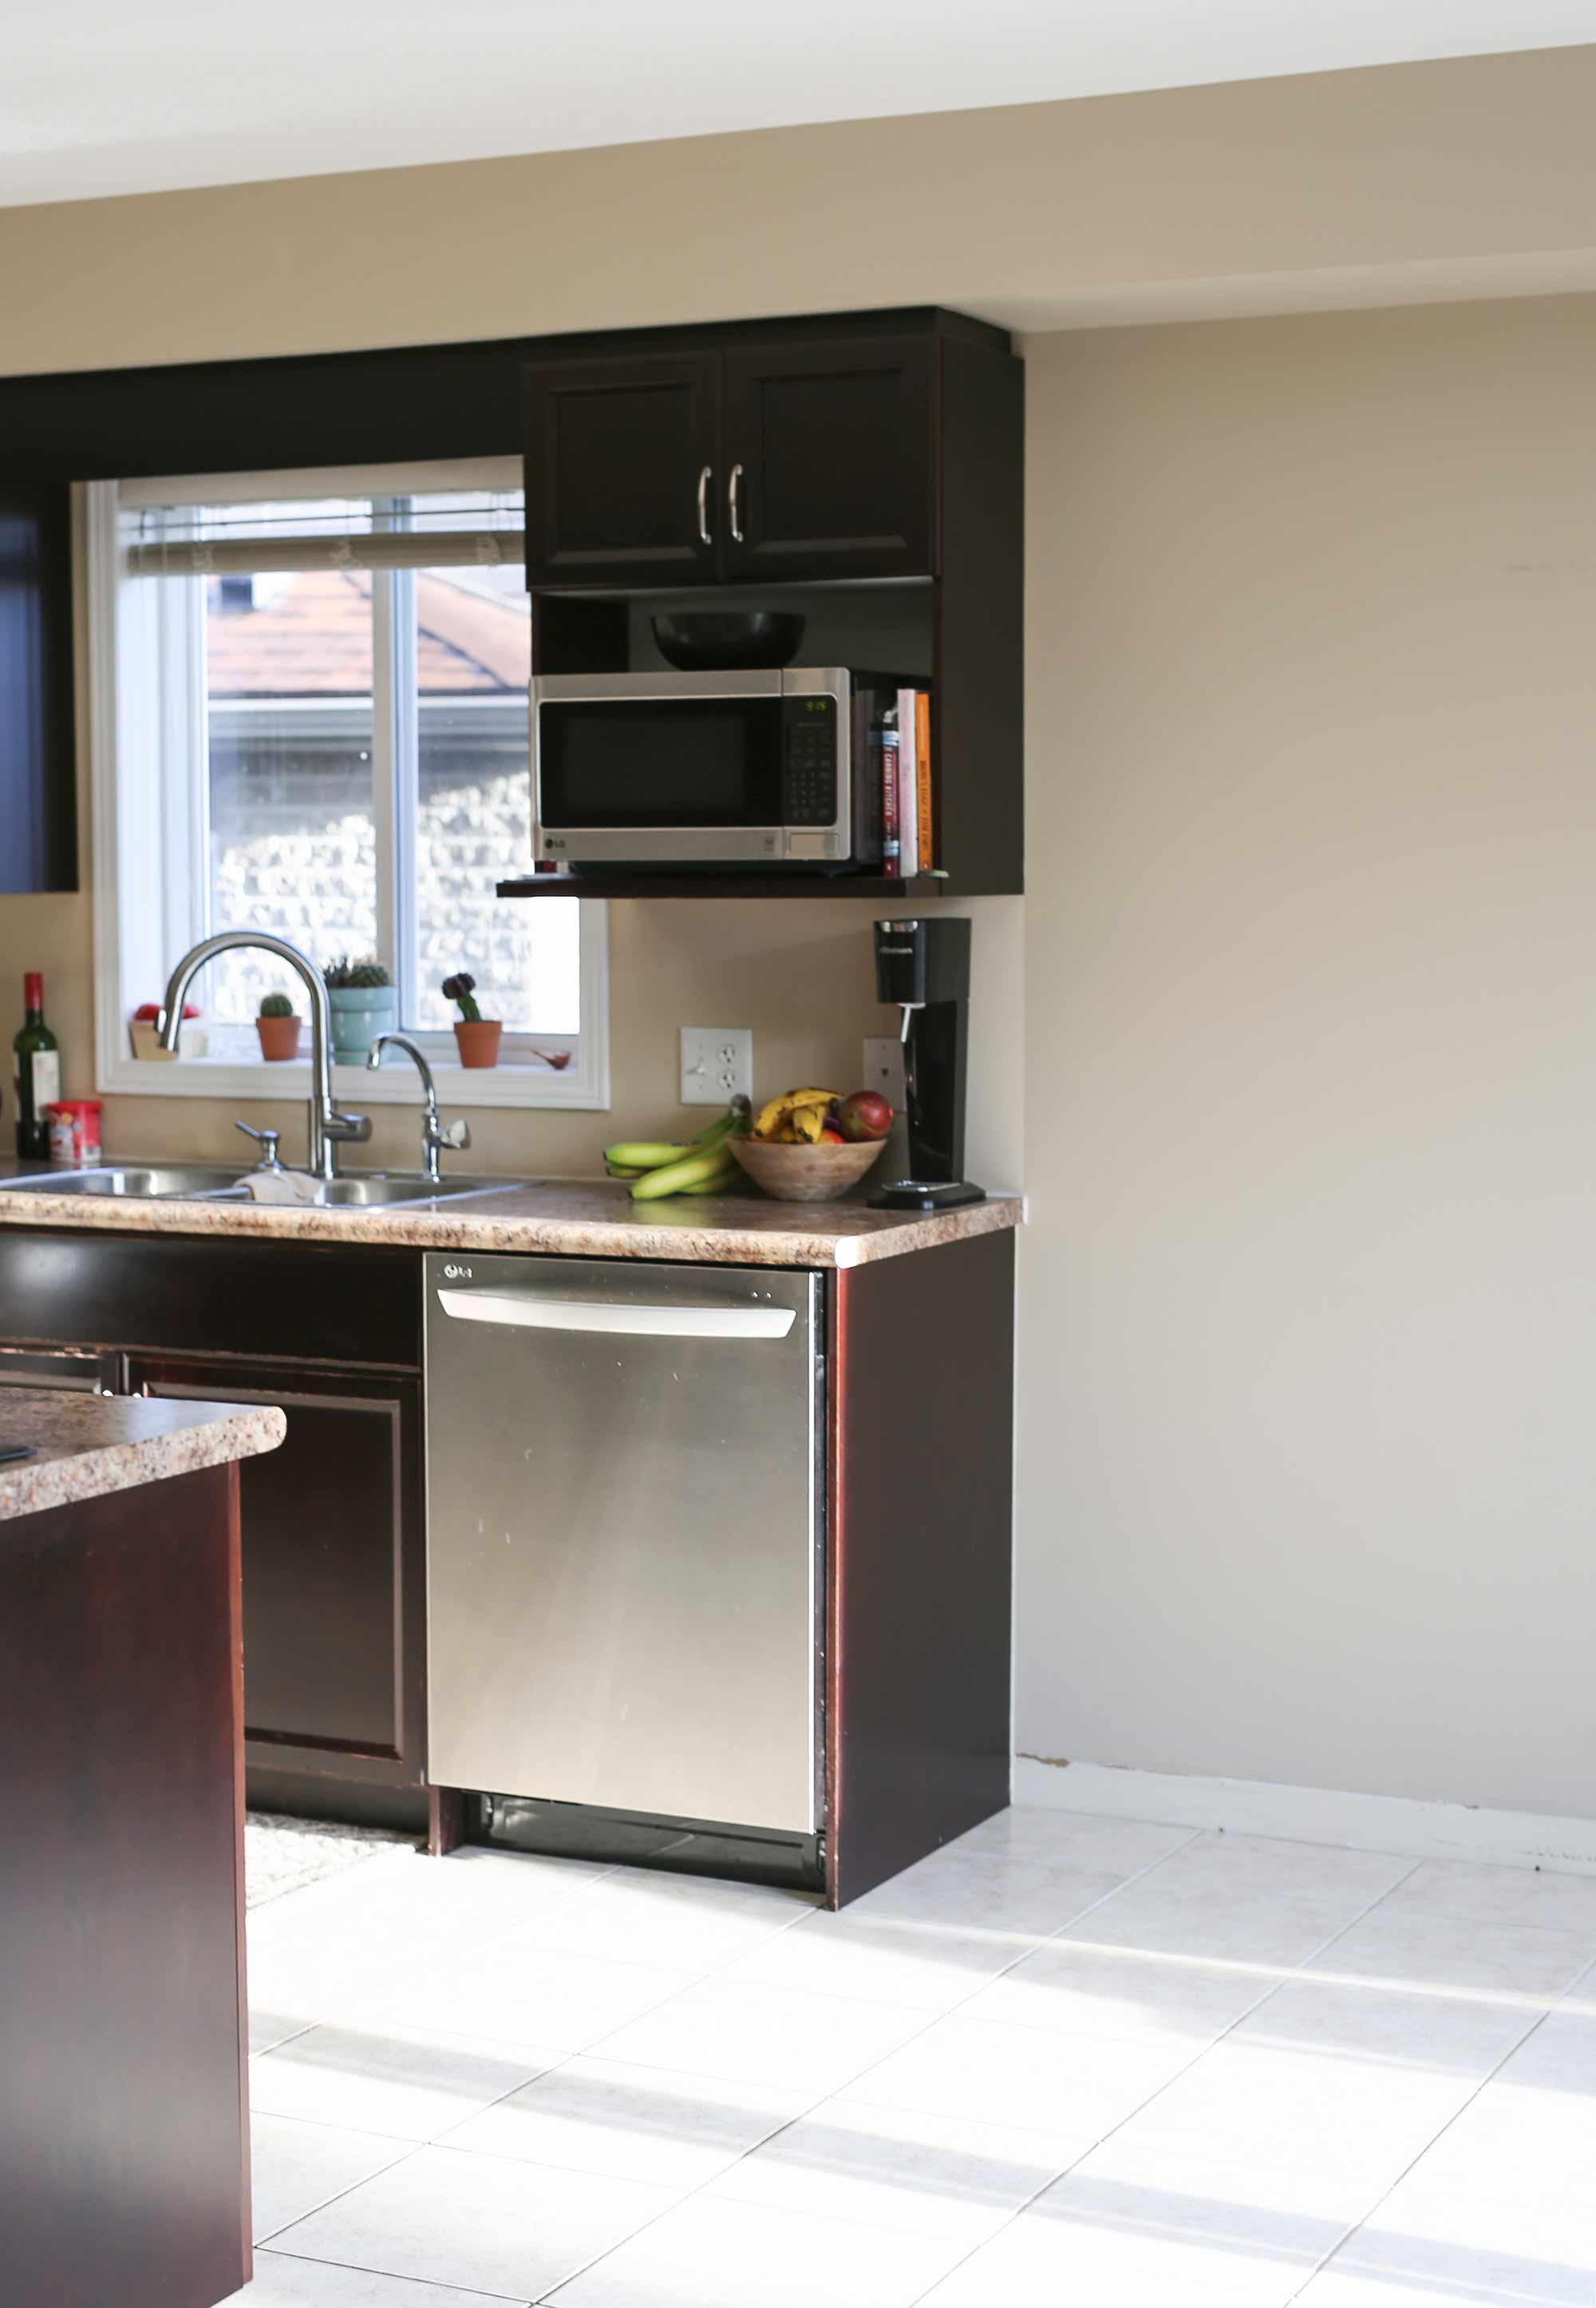 kitchen-before-renuit-reface